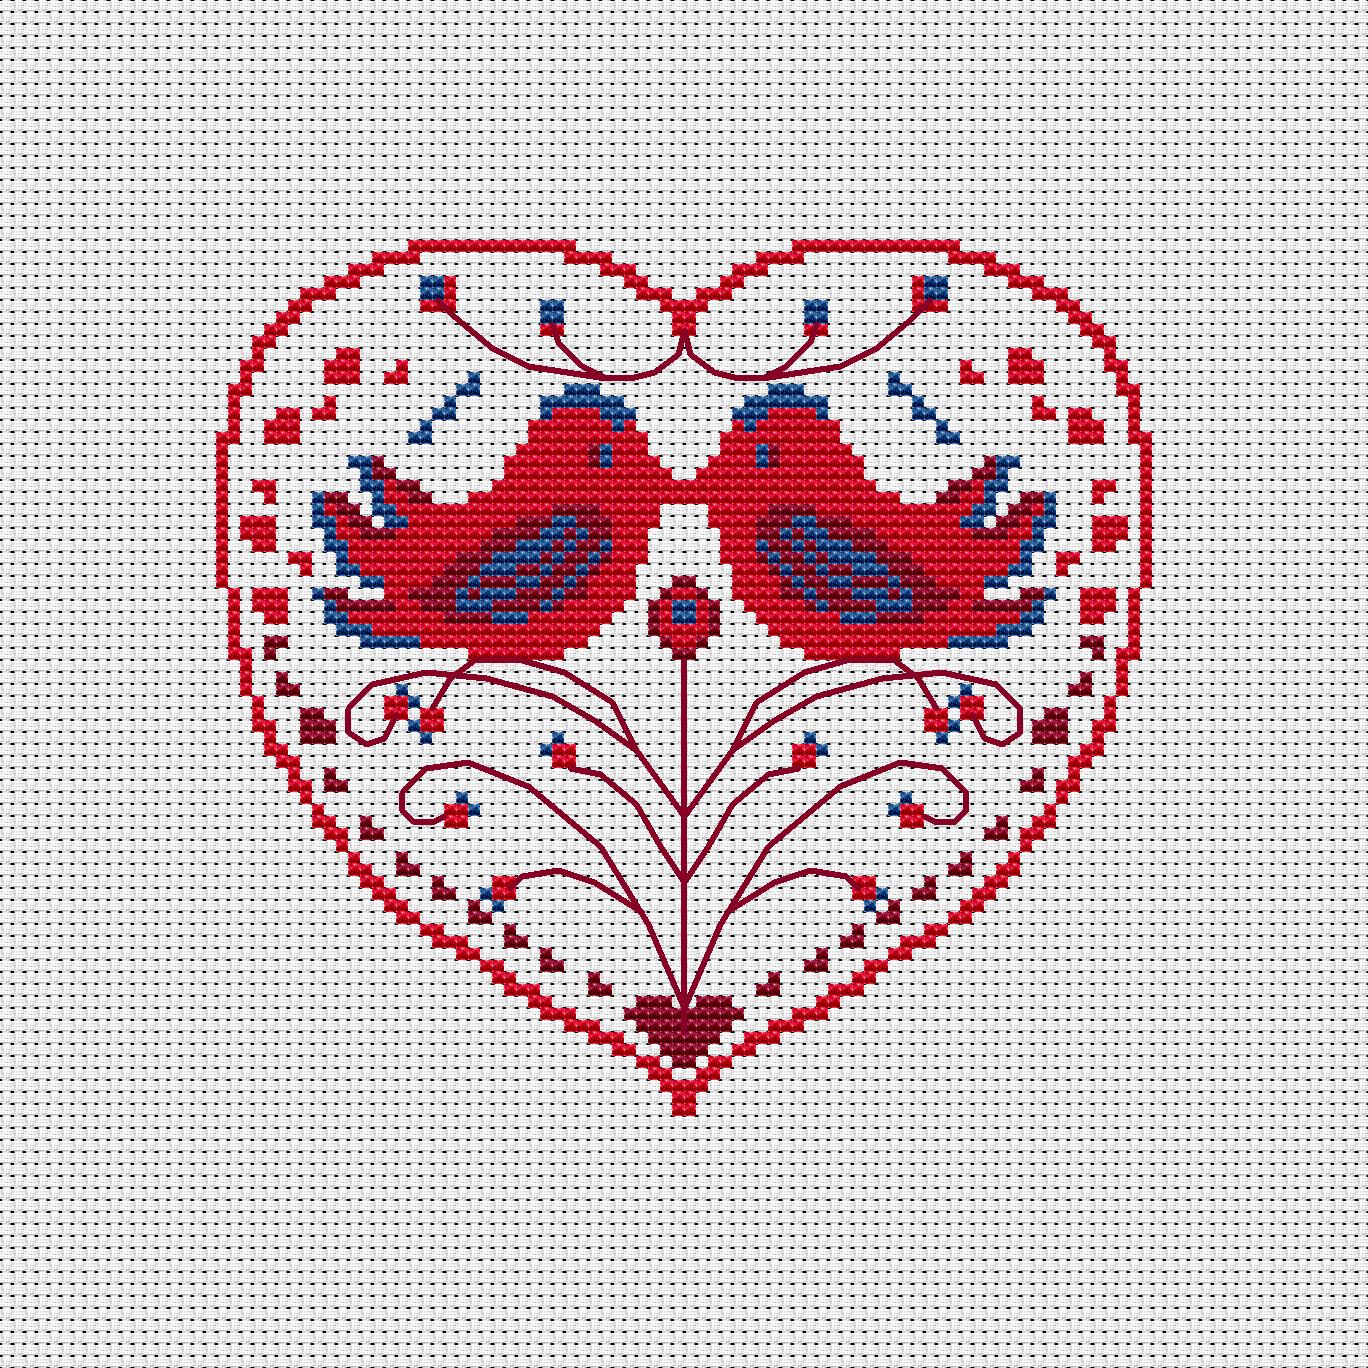 Scandinavian folk art style cross stitch pattern